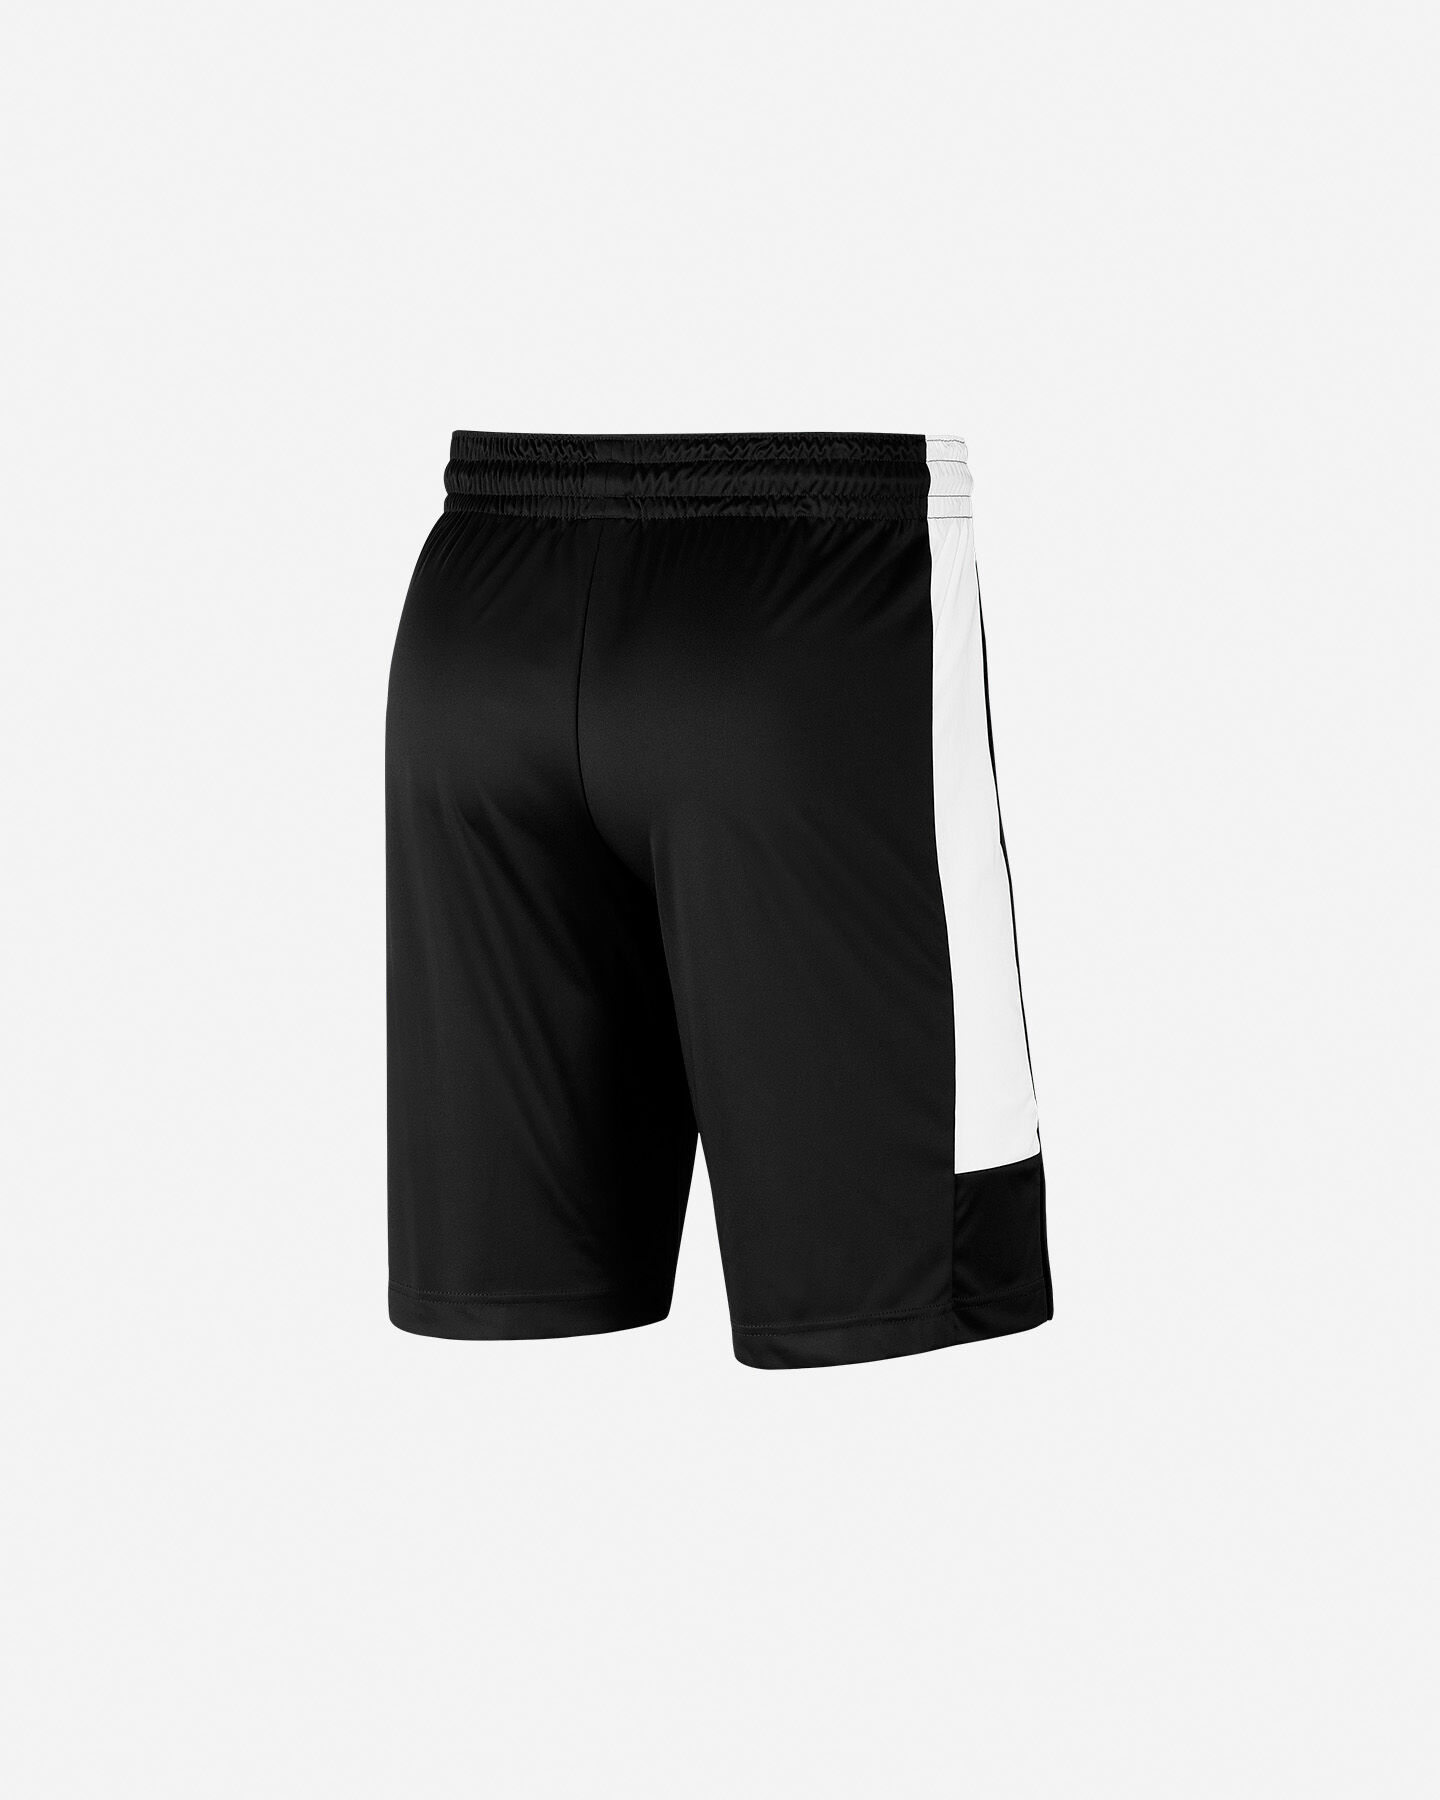 Pantaloncini basket NIKE JORDAN DRI-FIT 23 ALPHA M S5224675 scatto 2